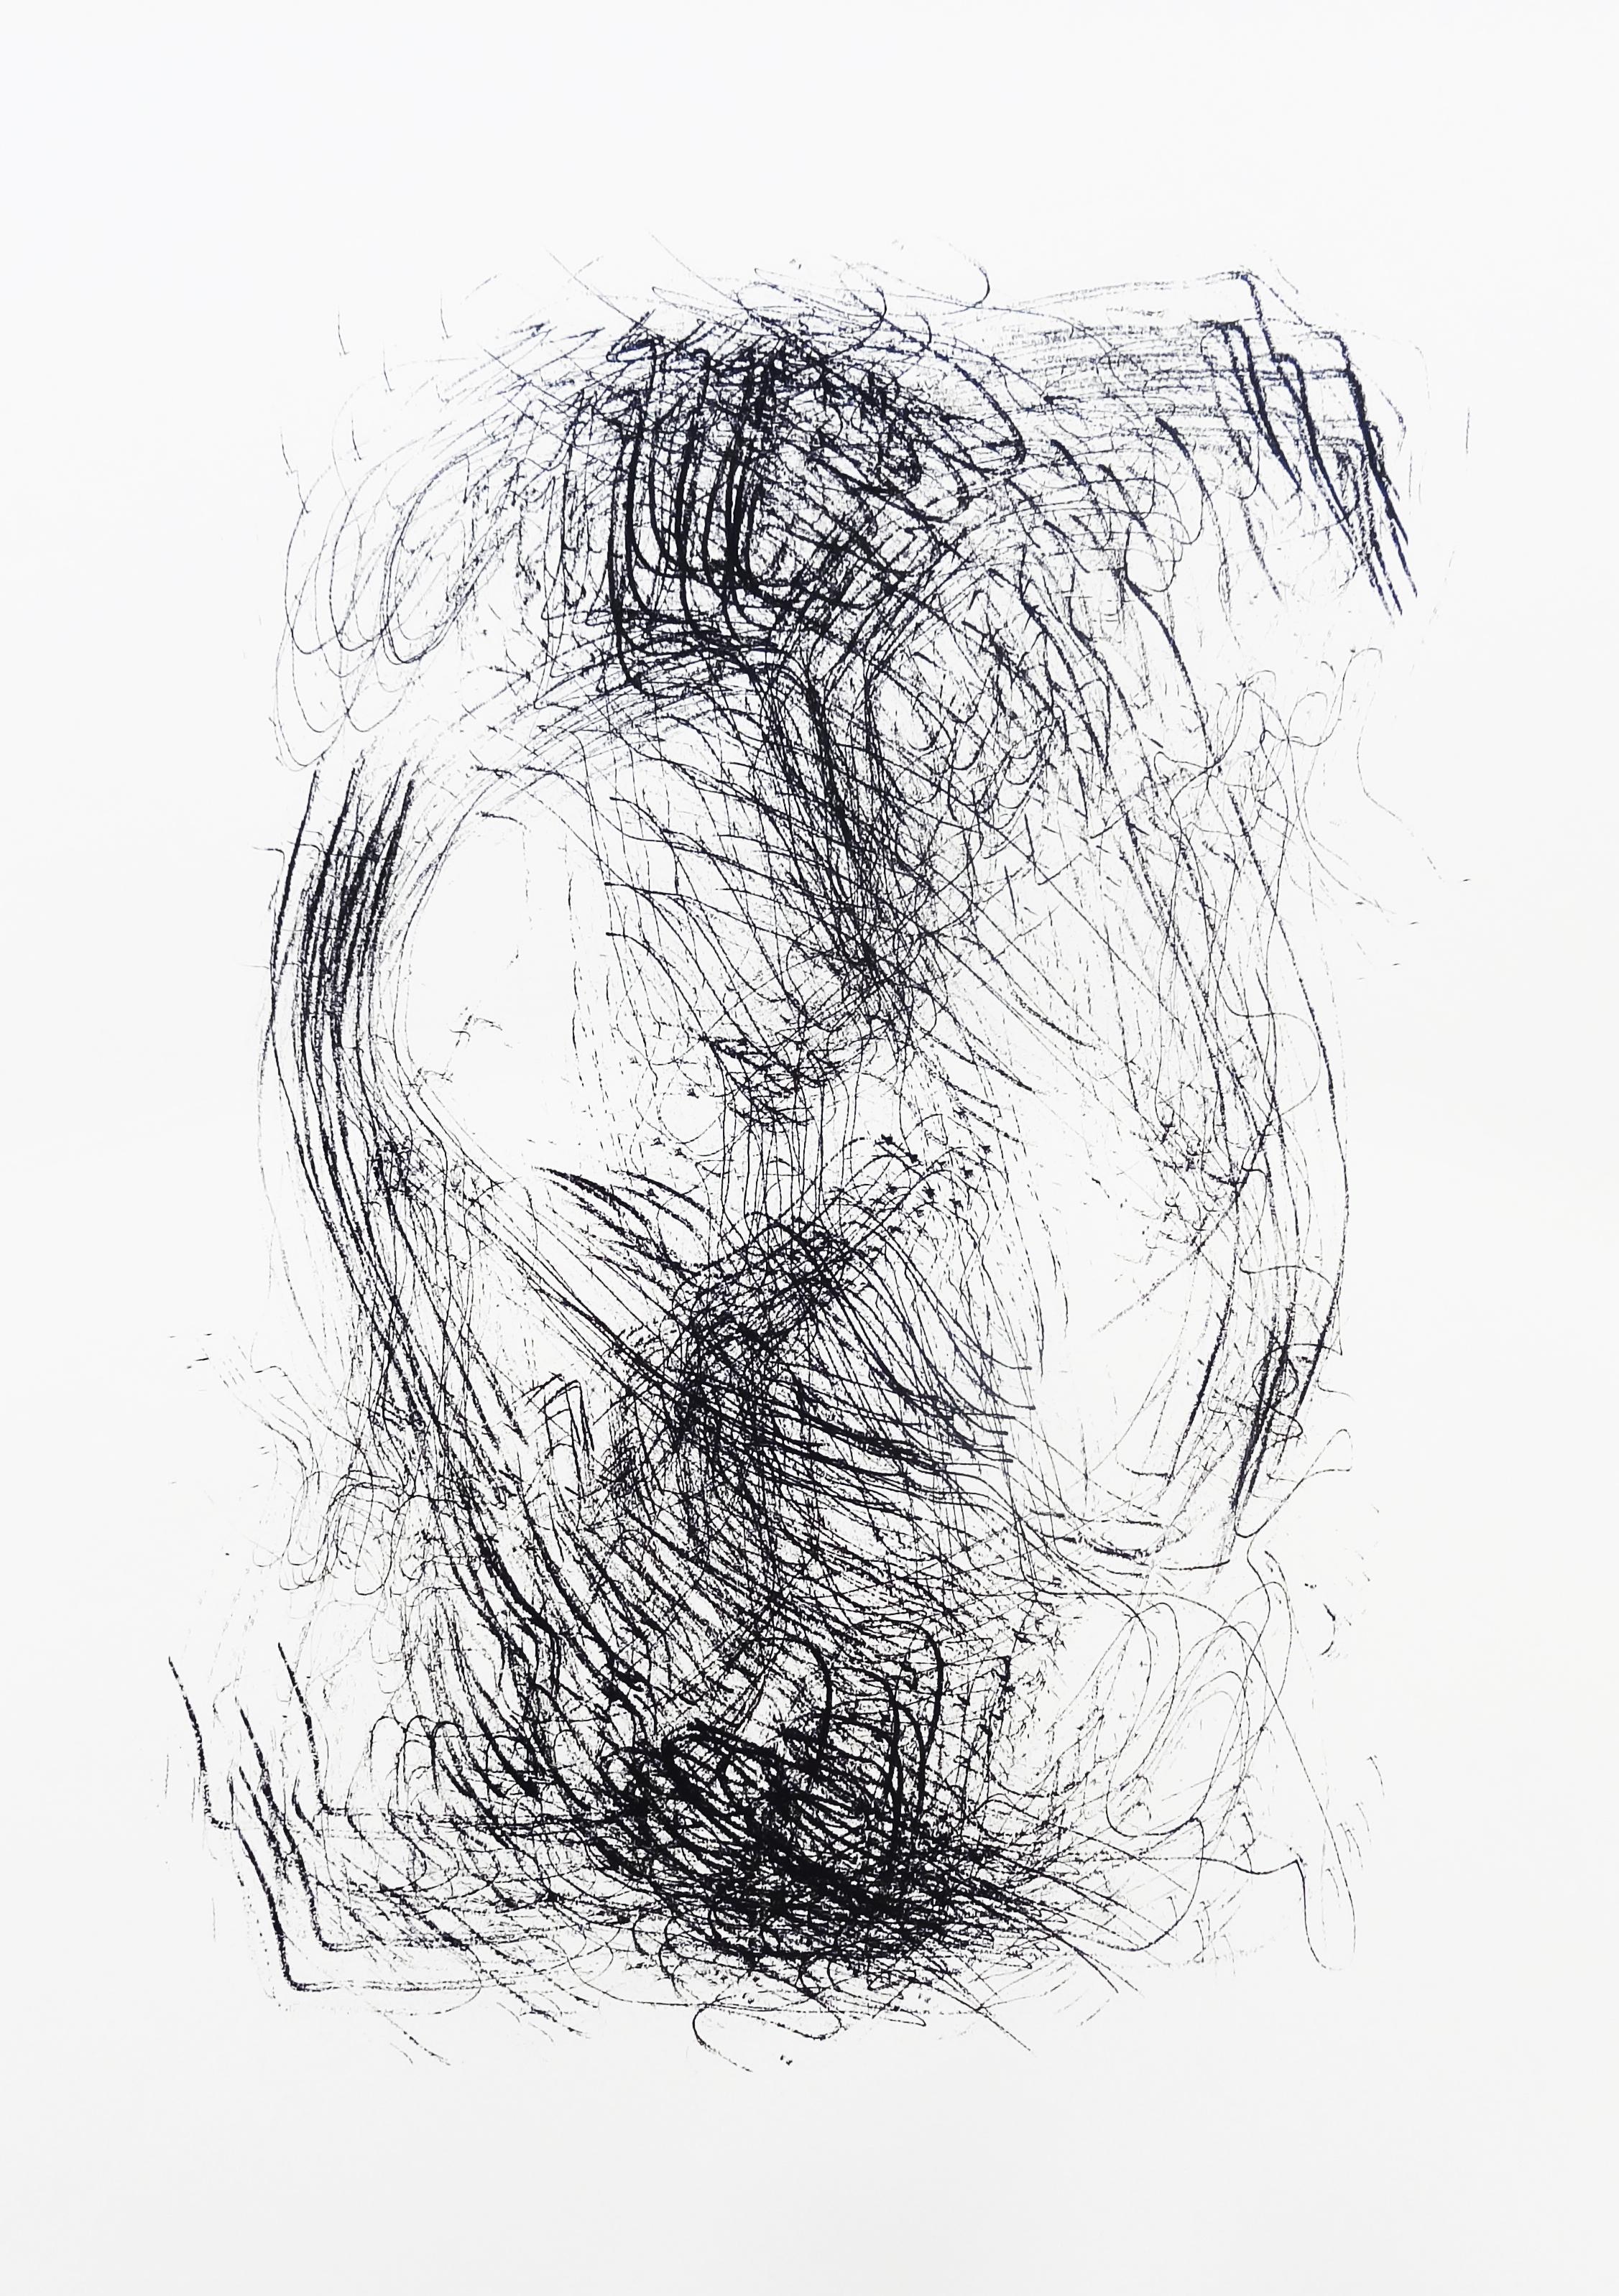 Untitled, 2015 acrylic on paper one-off screenprint 42,0 x 29,7 cm (8-15)